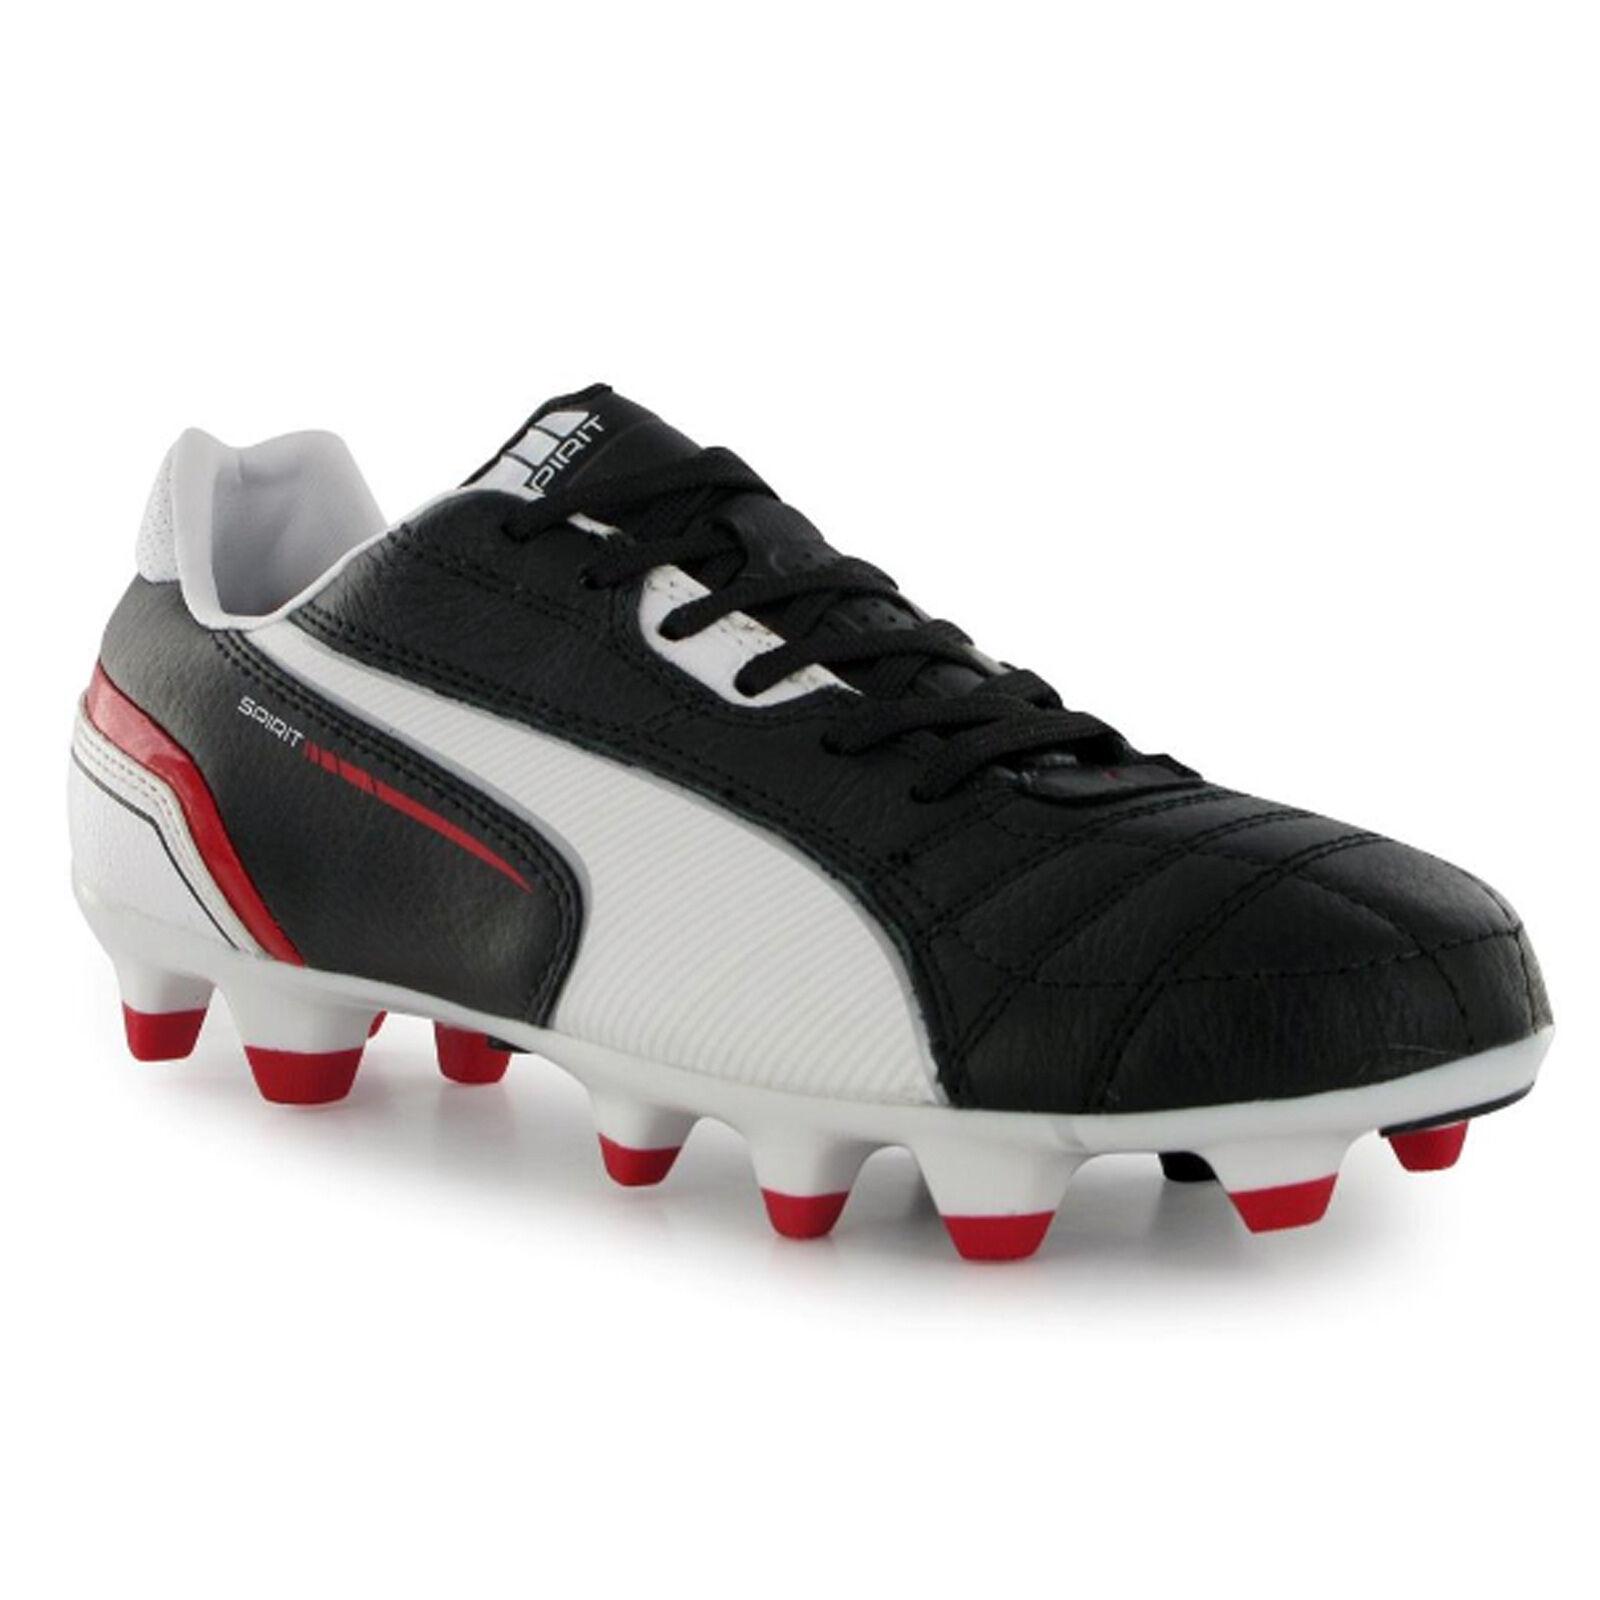 200f8e45b Puma Spirit FG Junior Kids Football Boots Shoes New - Red Black White